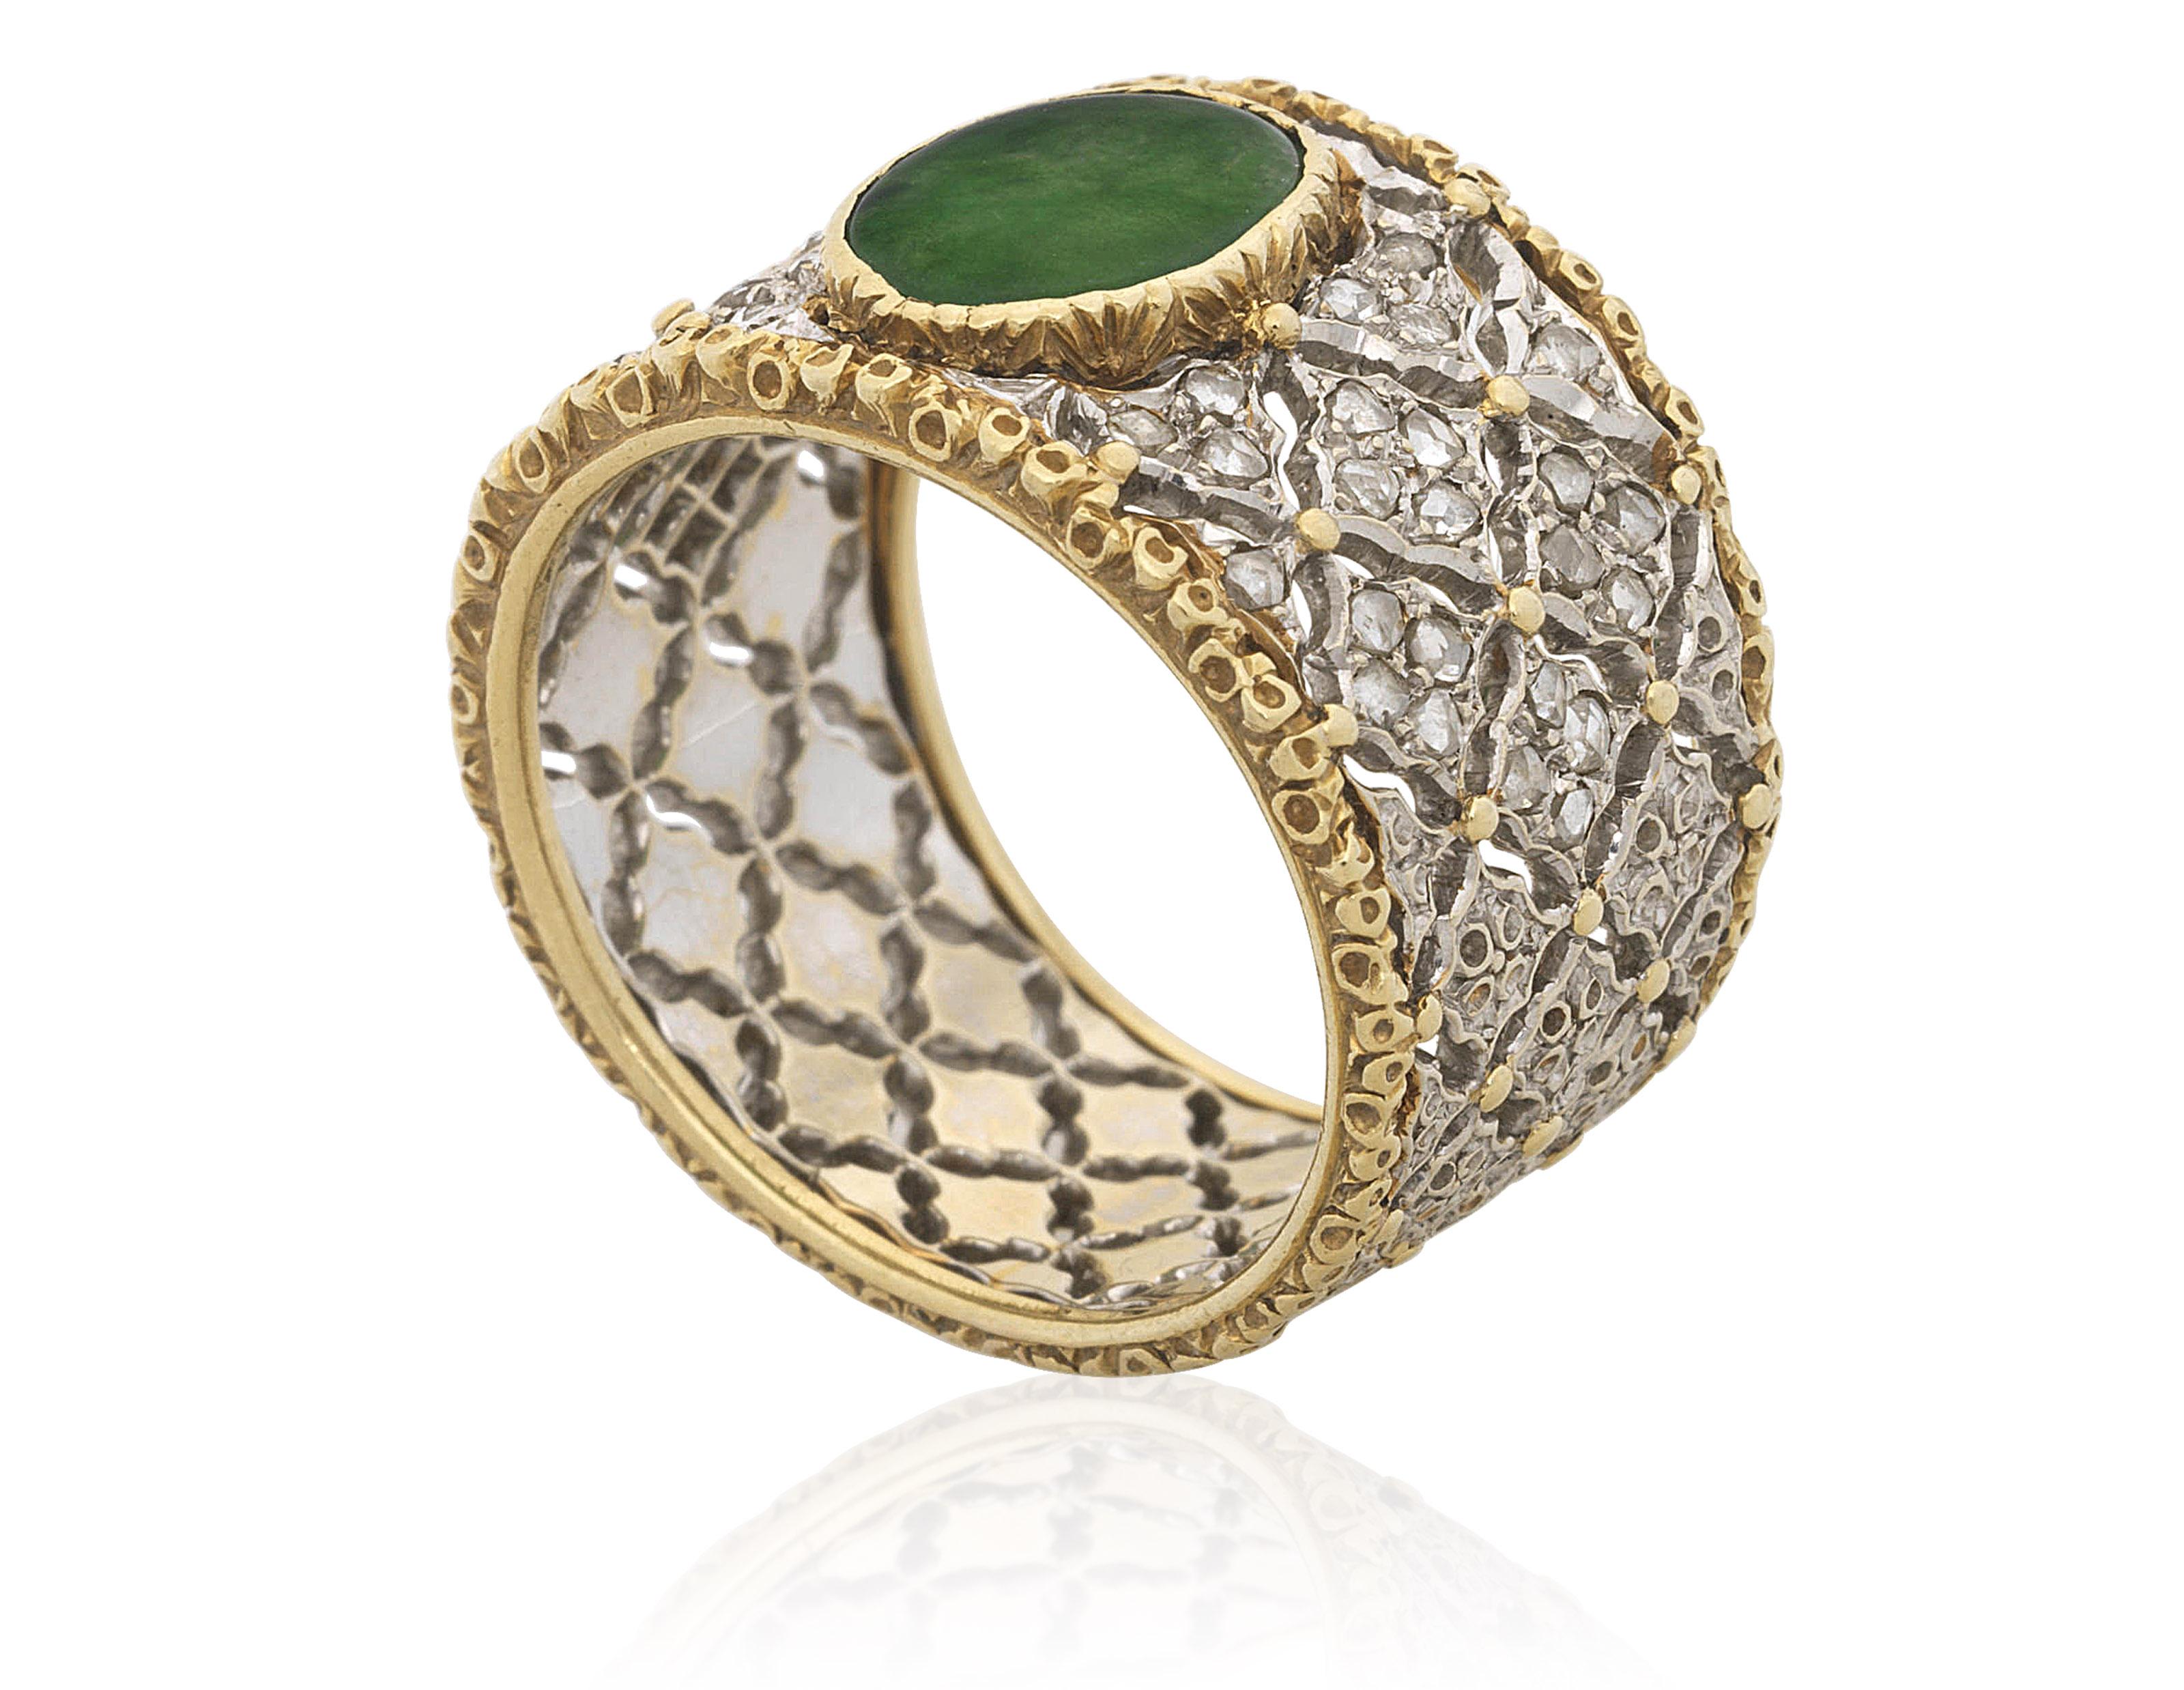 buccellati jade and diamond ring christie s. Black Bedroom Furniture Sets. Home Design Ideas